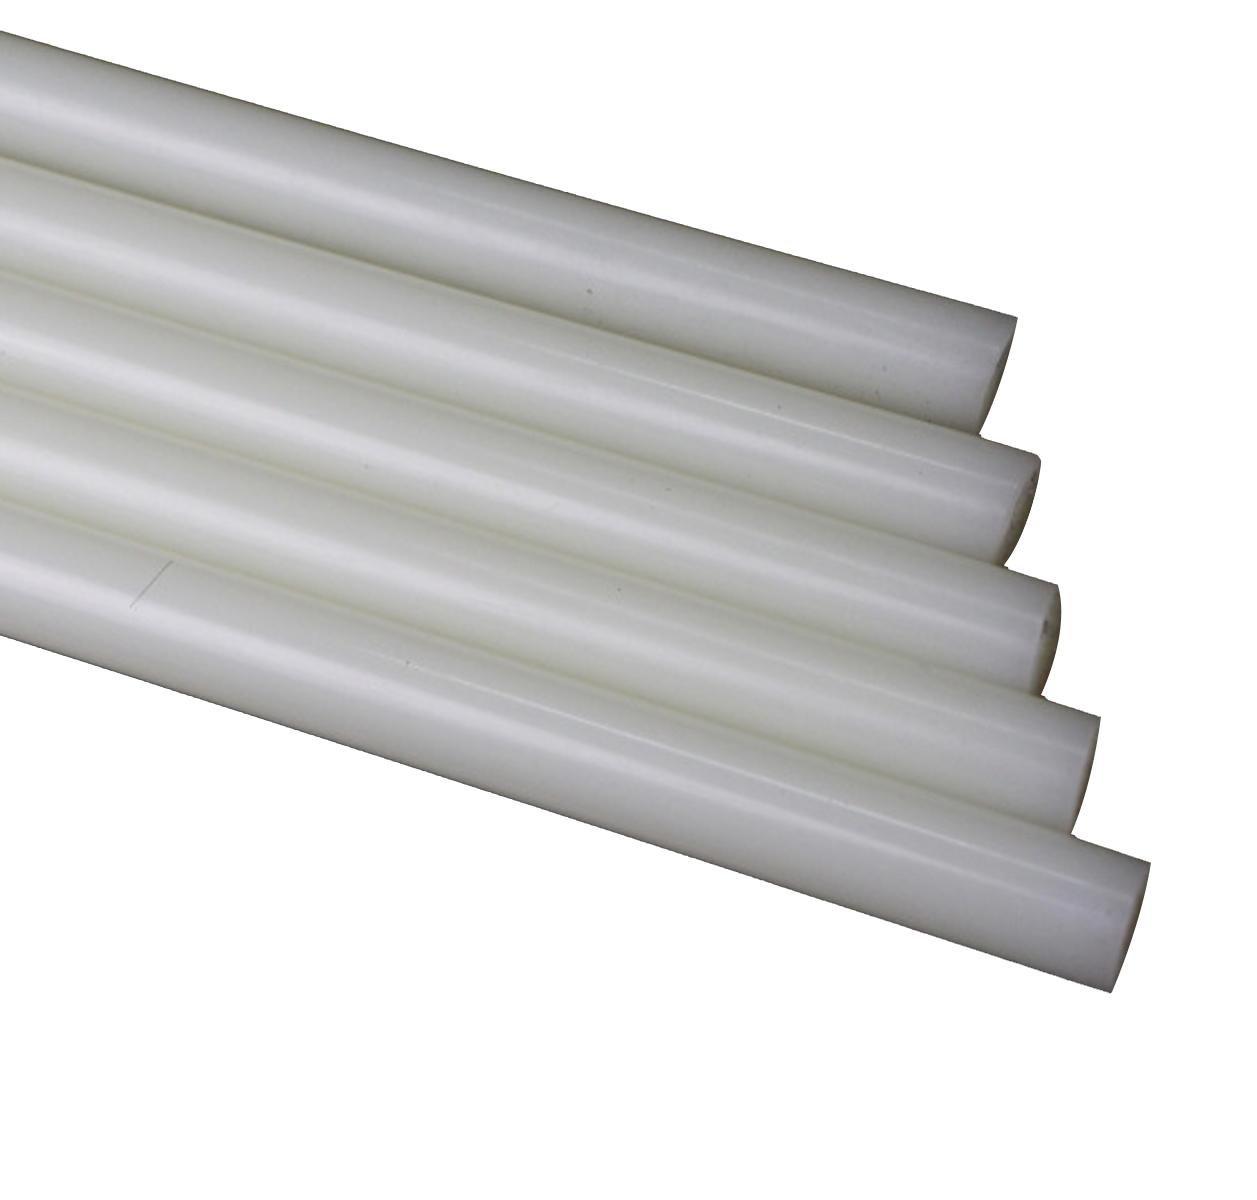 3pcs 35.5mm Diameter 13'' PA6 Nylon Round Rod Stick Bar Stock White by CGjiogujio